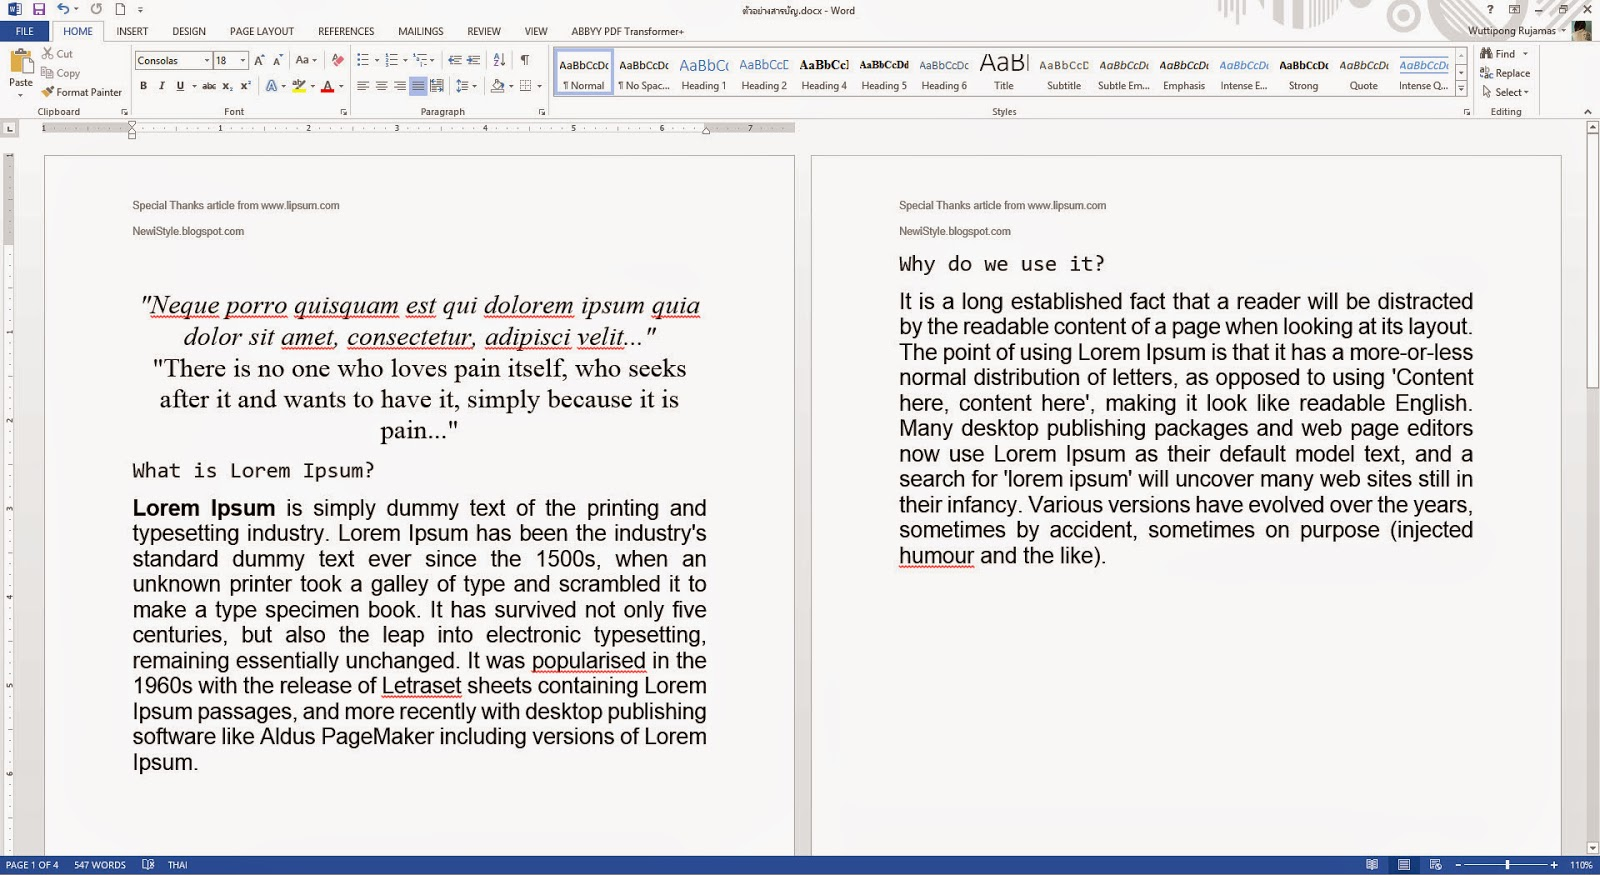 Microsoft Office Word - เปิดไฟล์เอกสารที่ต้องการจะสร้างสารบัญ